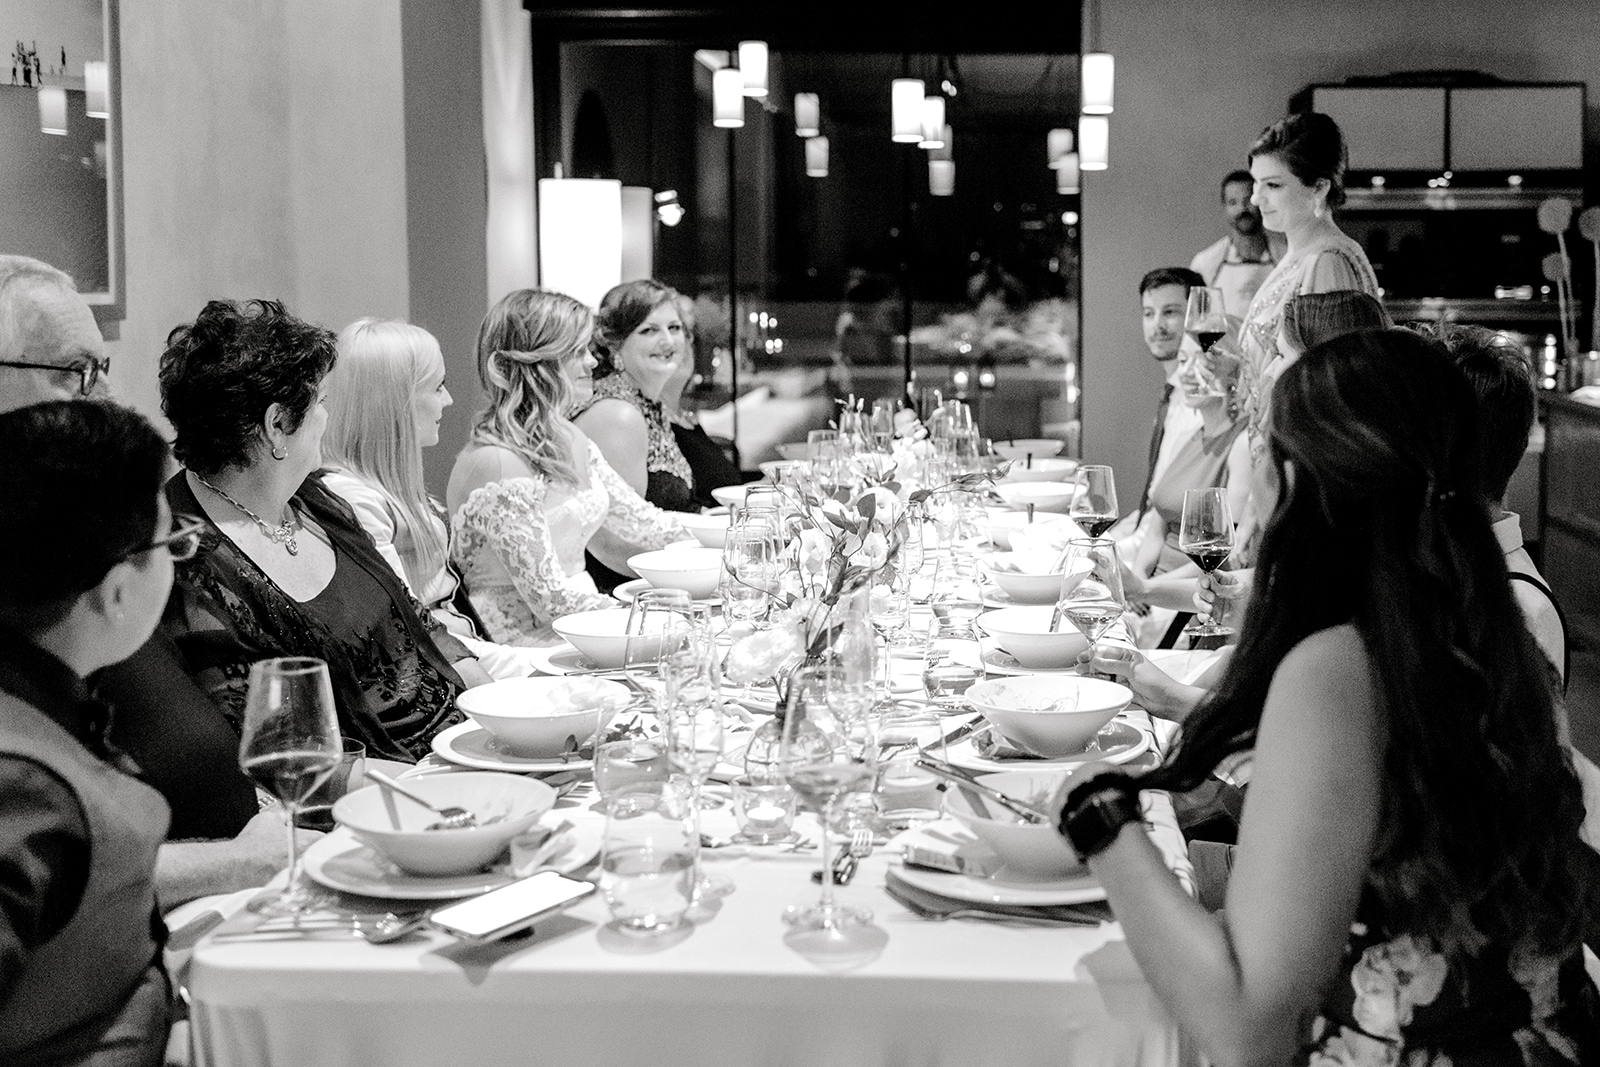 Four Corners Photography Liz and Jessica Wedding in Barcelona Finals-719best atlanta wedding photographer barcelona wedding atlanta wedding spain wedding photographer barcelona wedding photographer.jpg